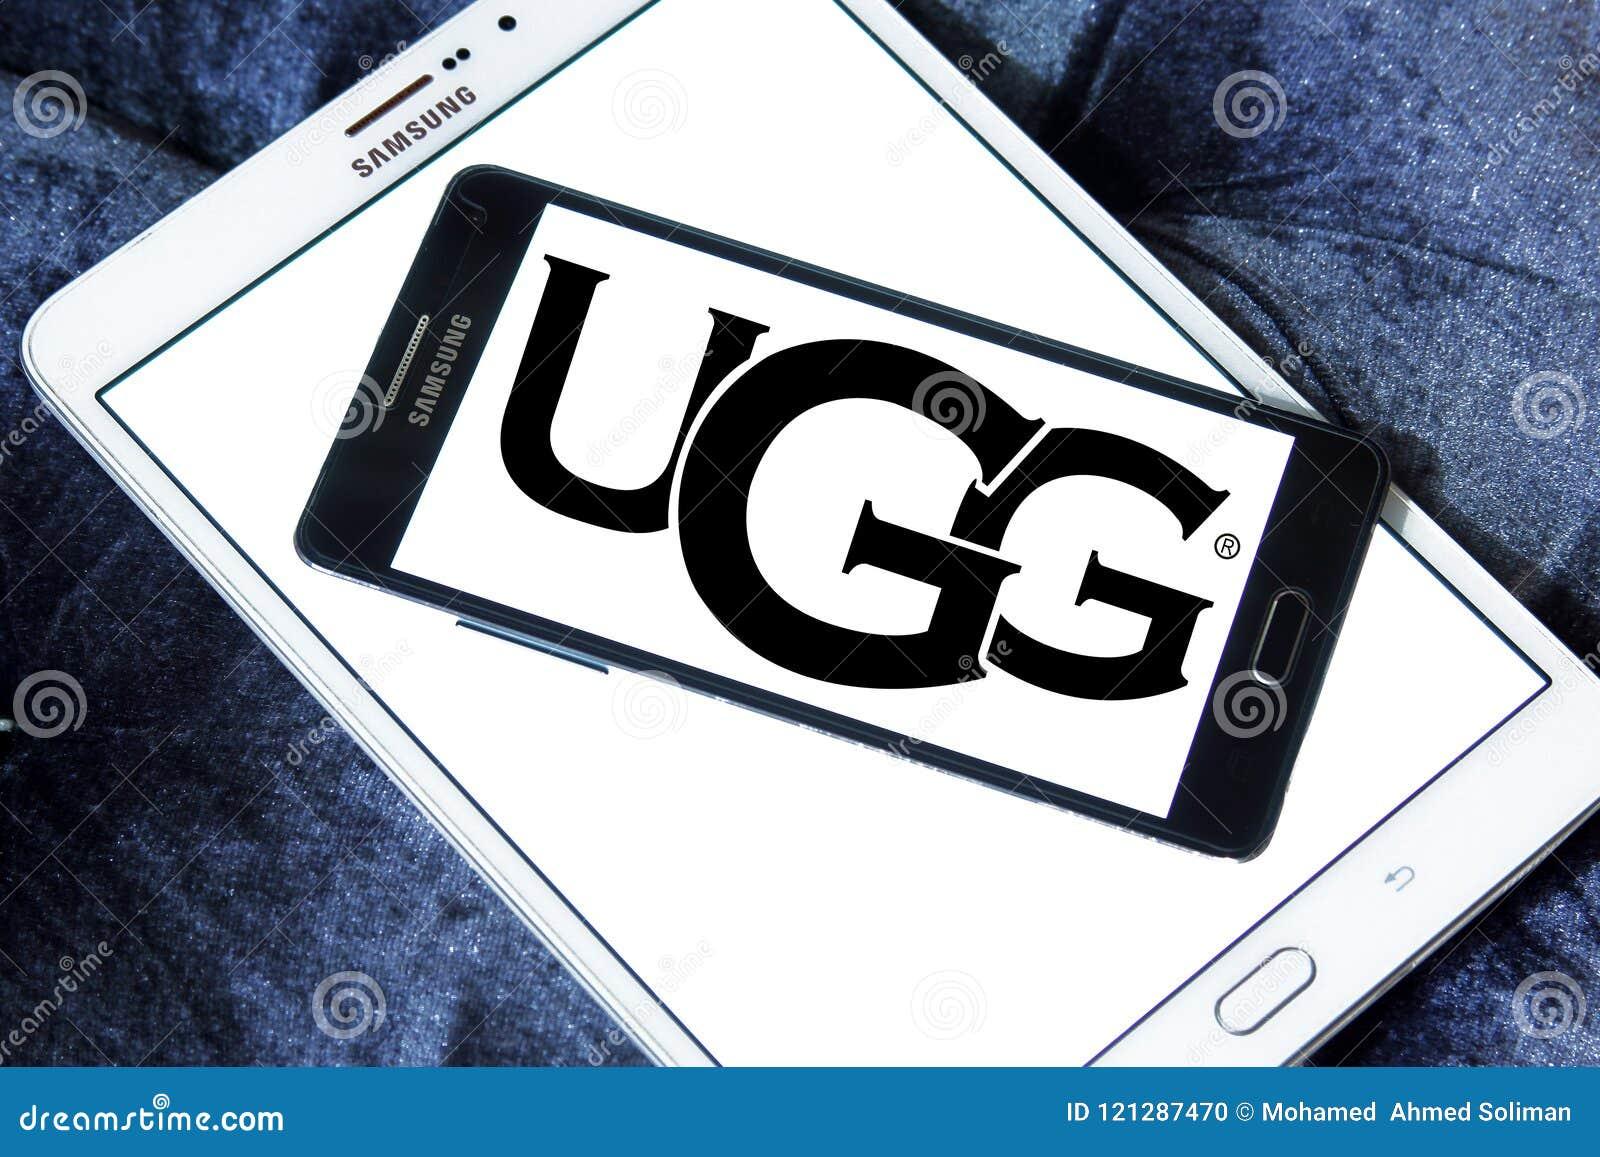 UGG footwear brand logo editorial image  Image of icon